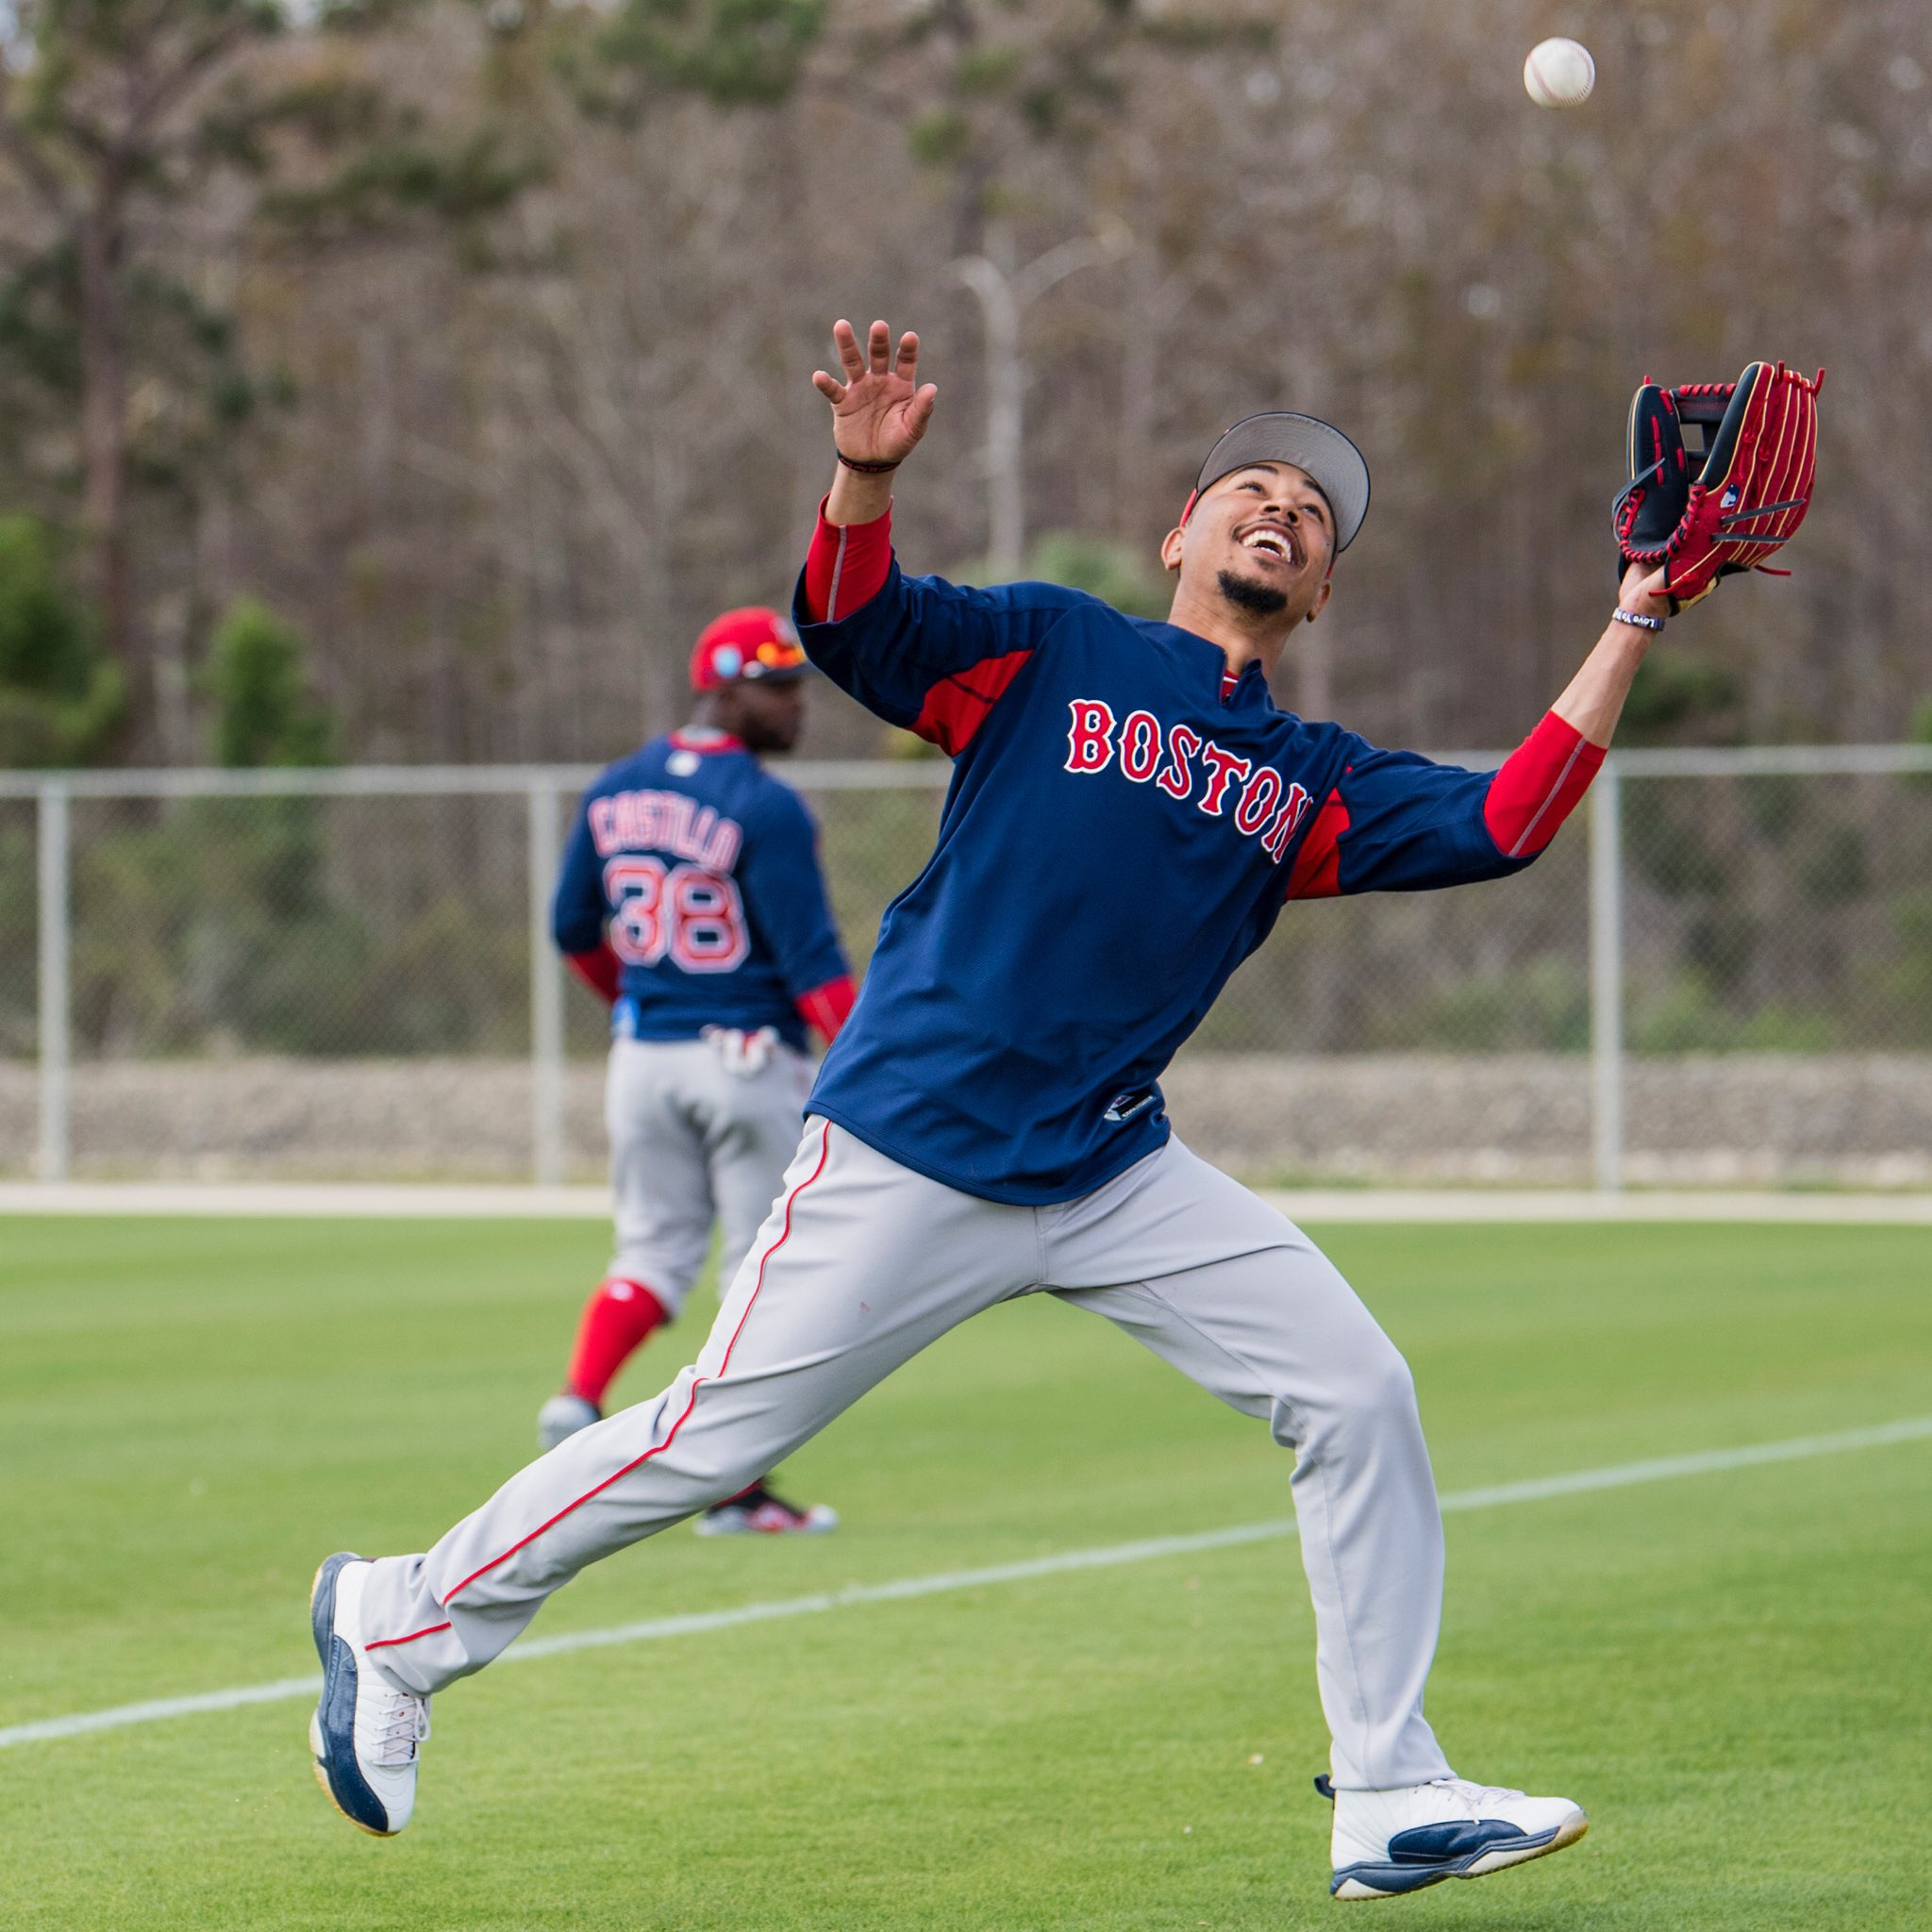 A brief glimpse into #SoxSpring:  Fielding Fielding  Fielding Fielding  Fielding  Fielding  Fielding https://t.co/JJKEbbatLl